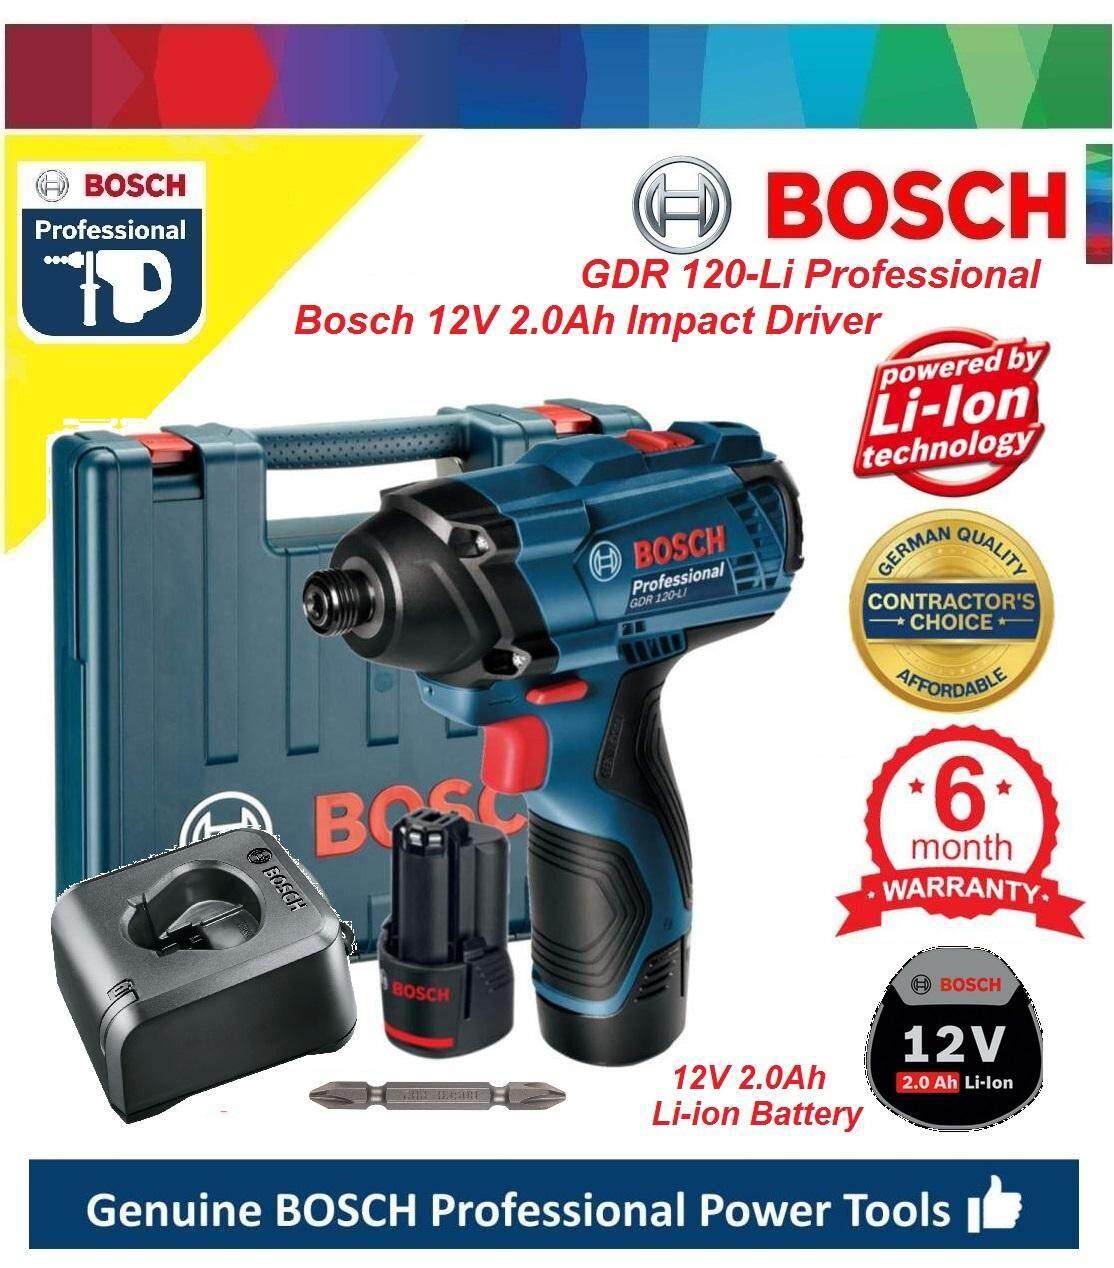 New Bosch GDR 12V 2.0Ah Cordless Compact Hex Impact Driver, Cordless Impact Driver